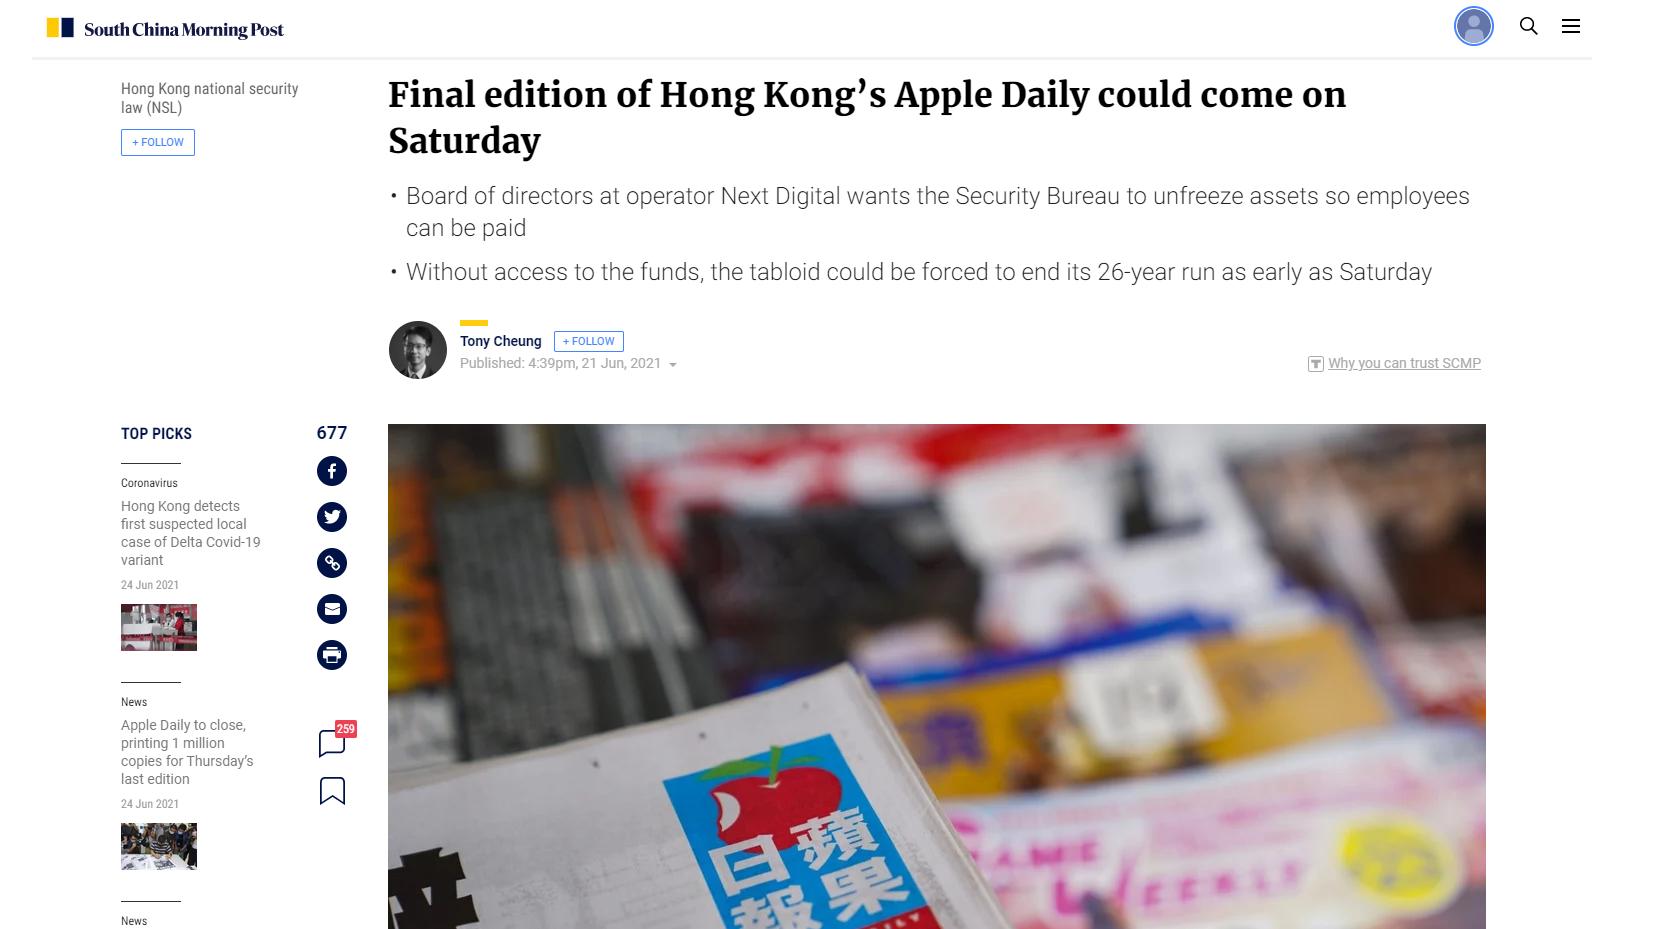 SCMP interview regarding Apple Daily - News